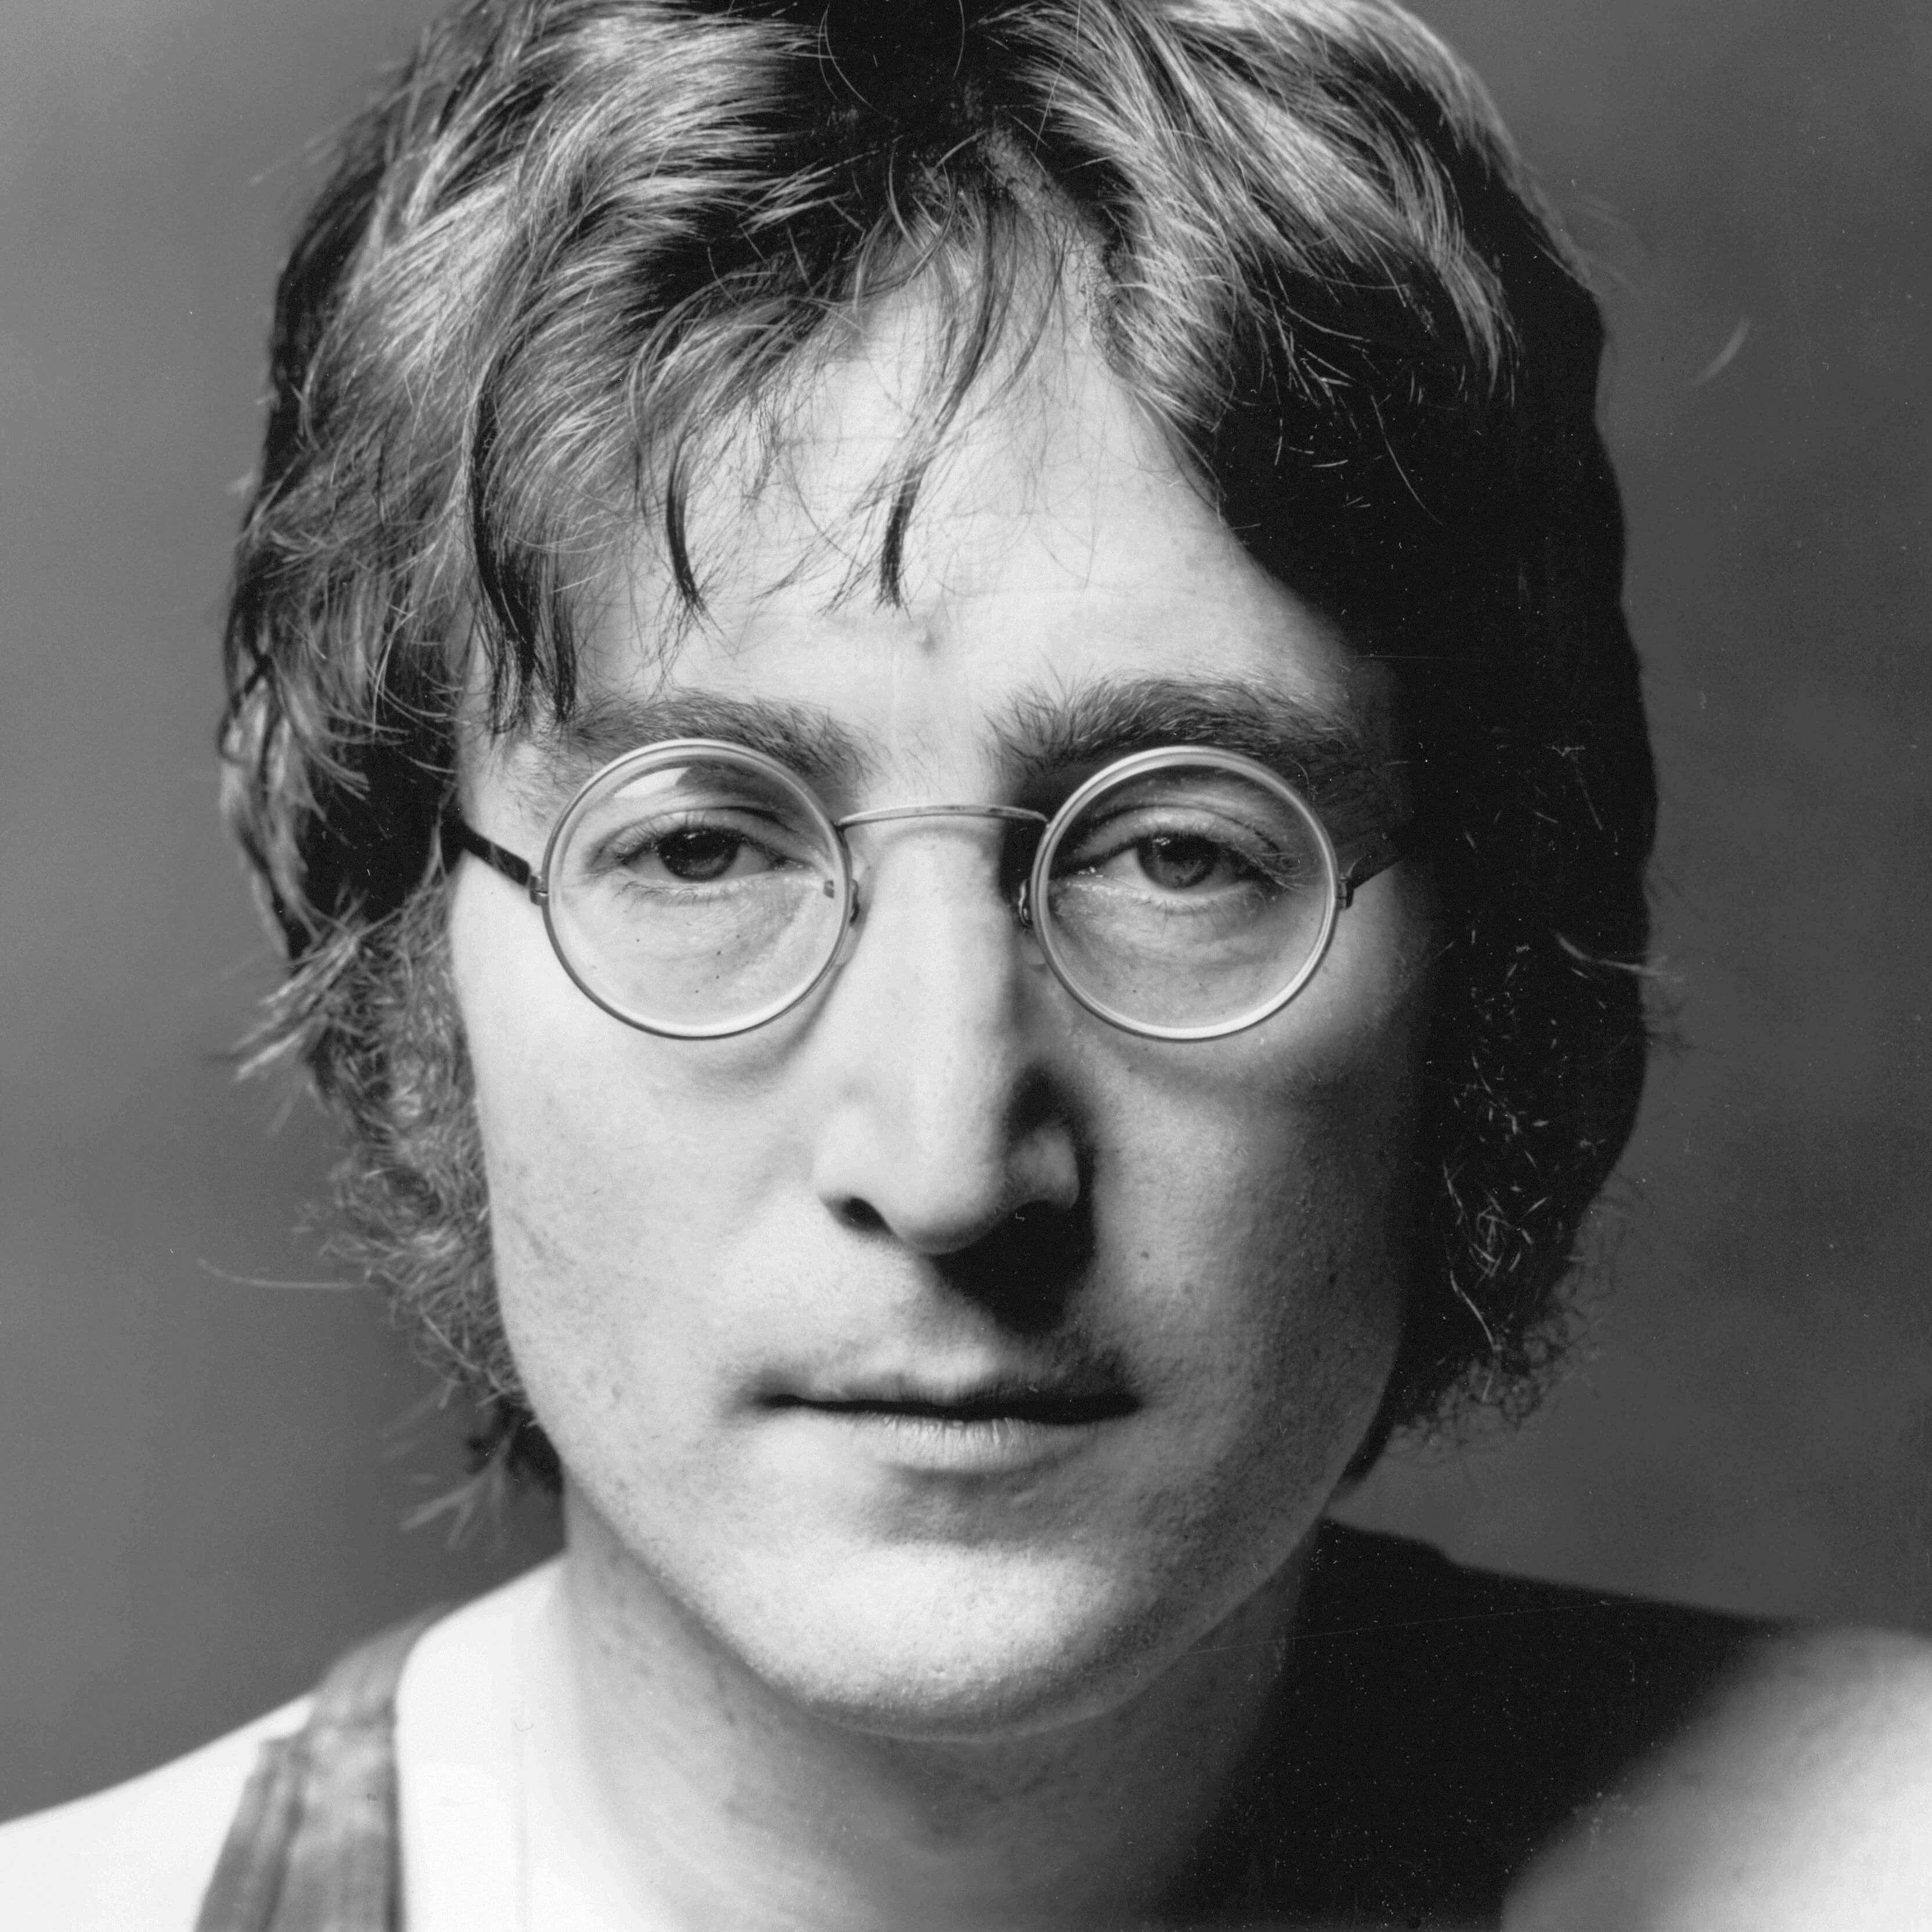 Sydney Recording Studio John Lennon